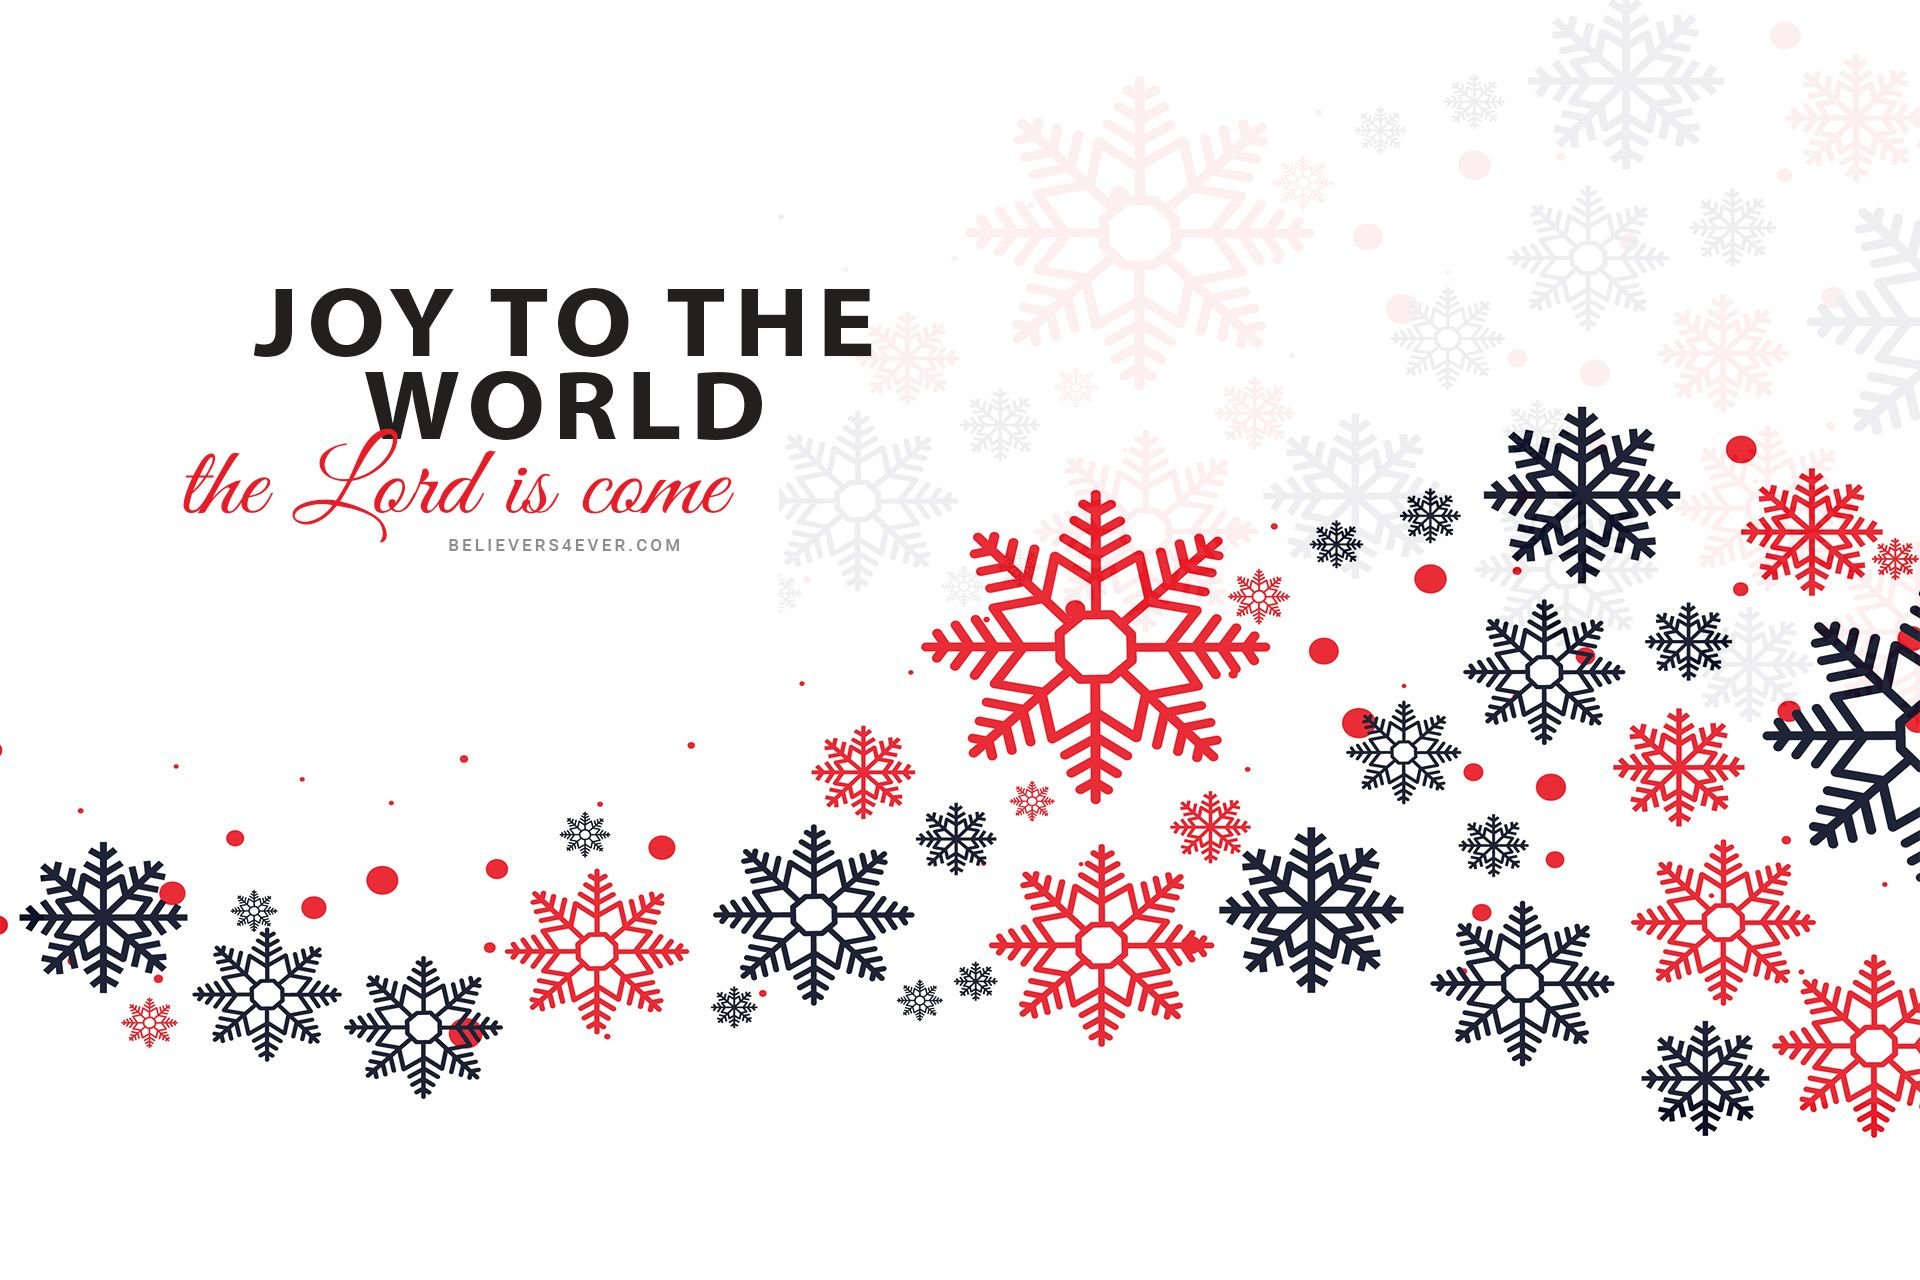 Joy To The World Free Christian Wallpaper Christian Wallpaper